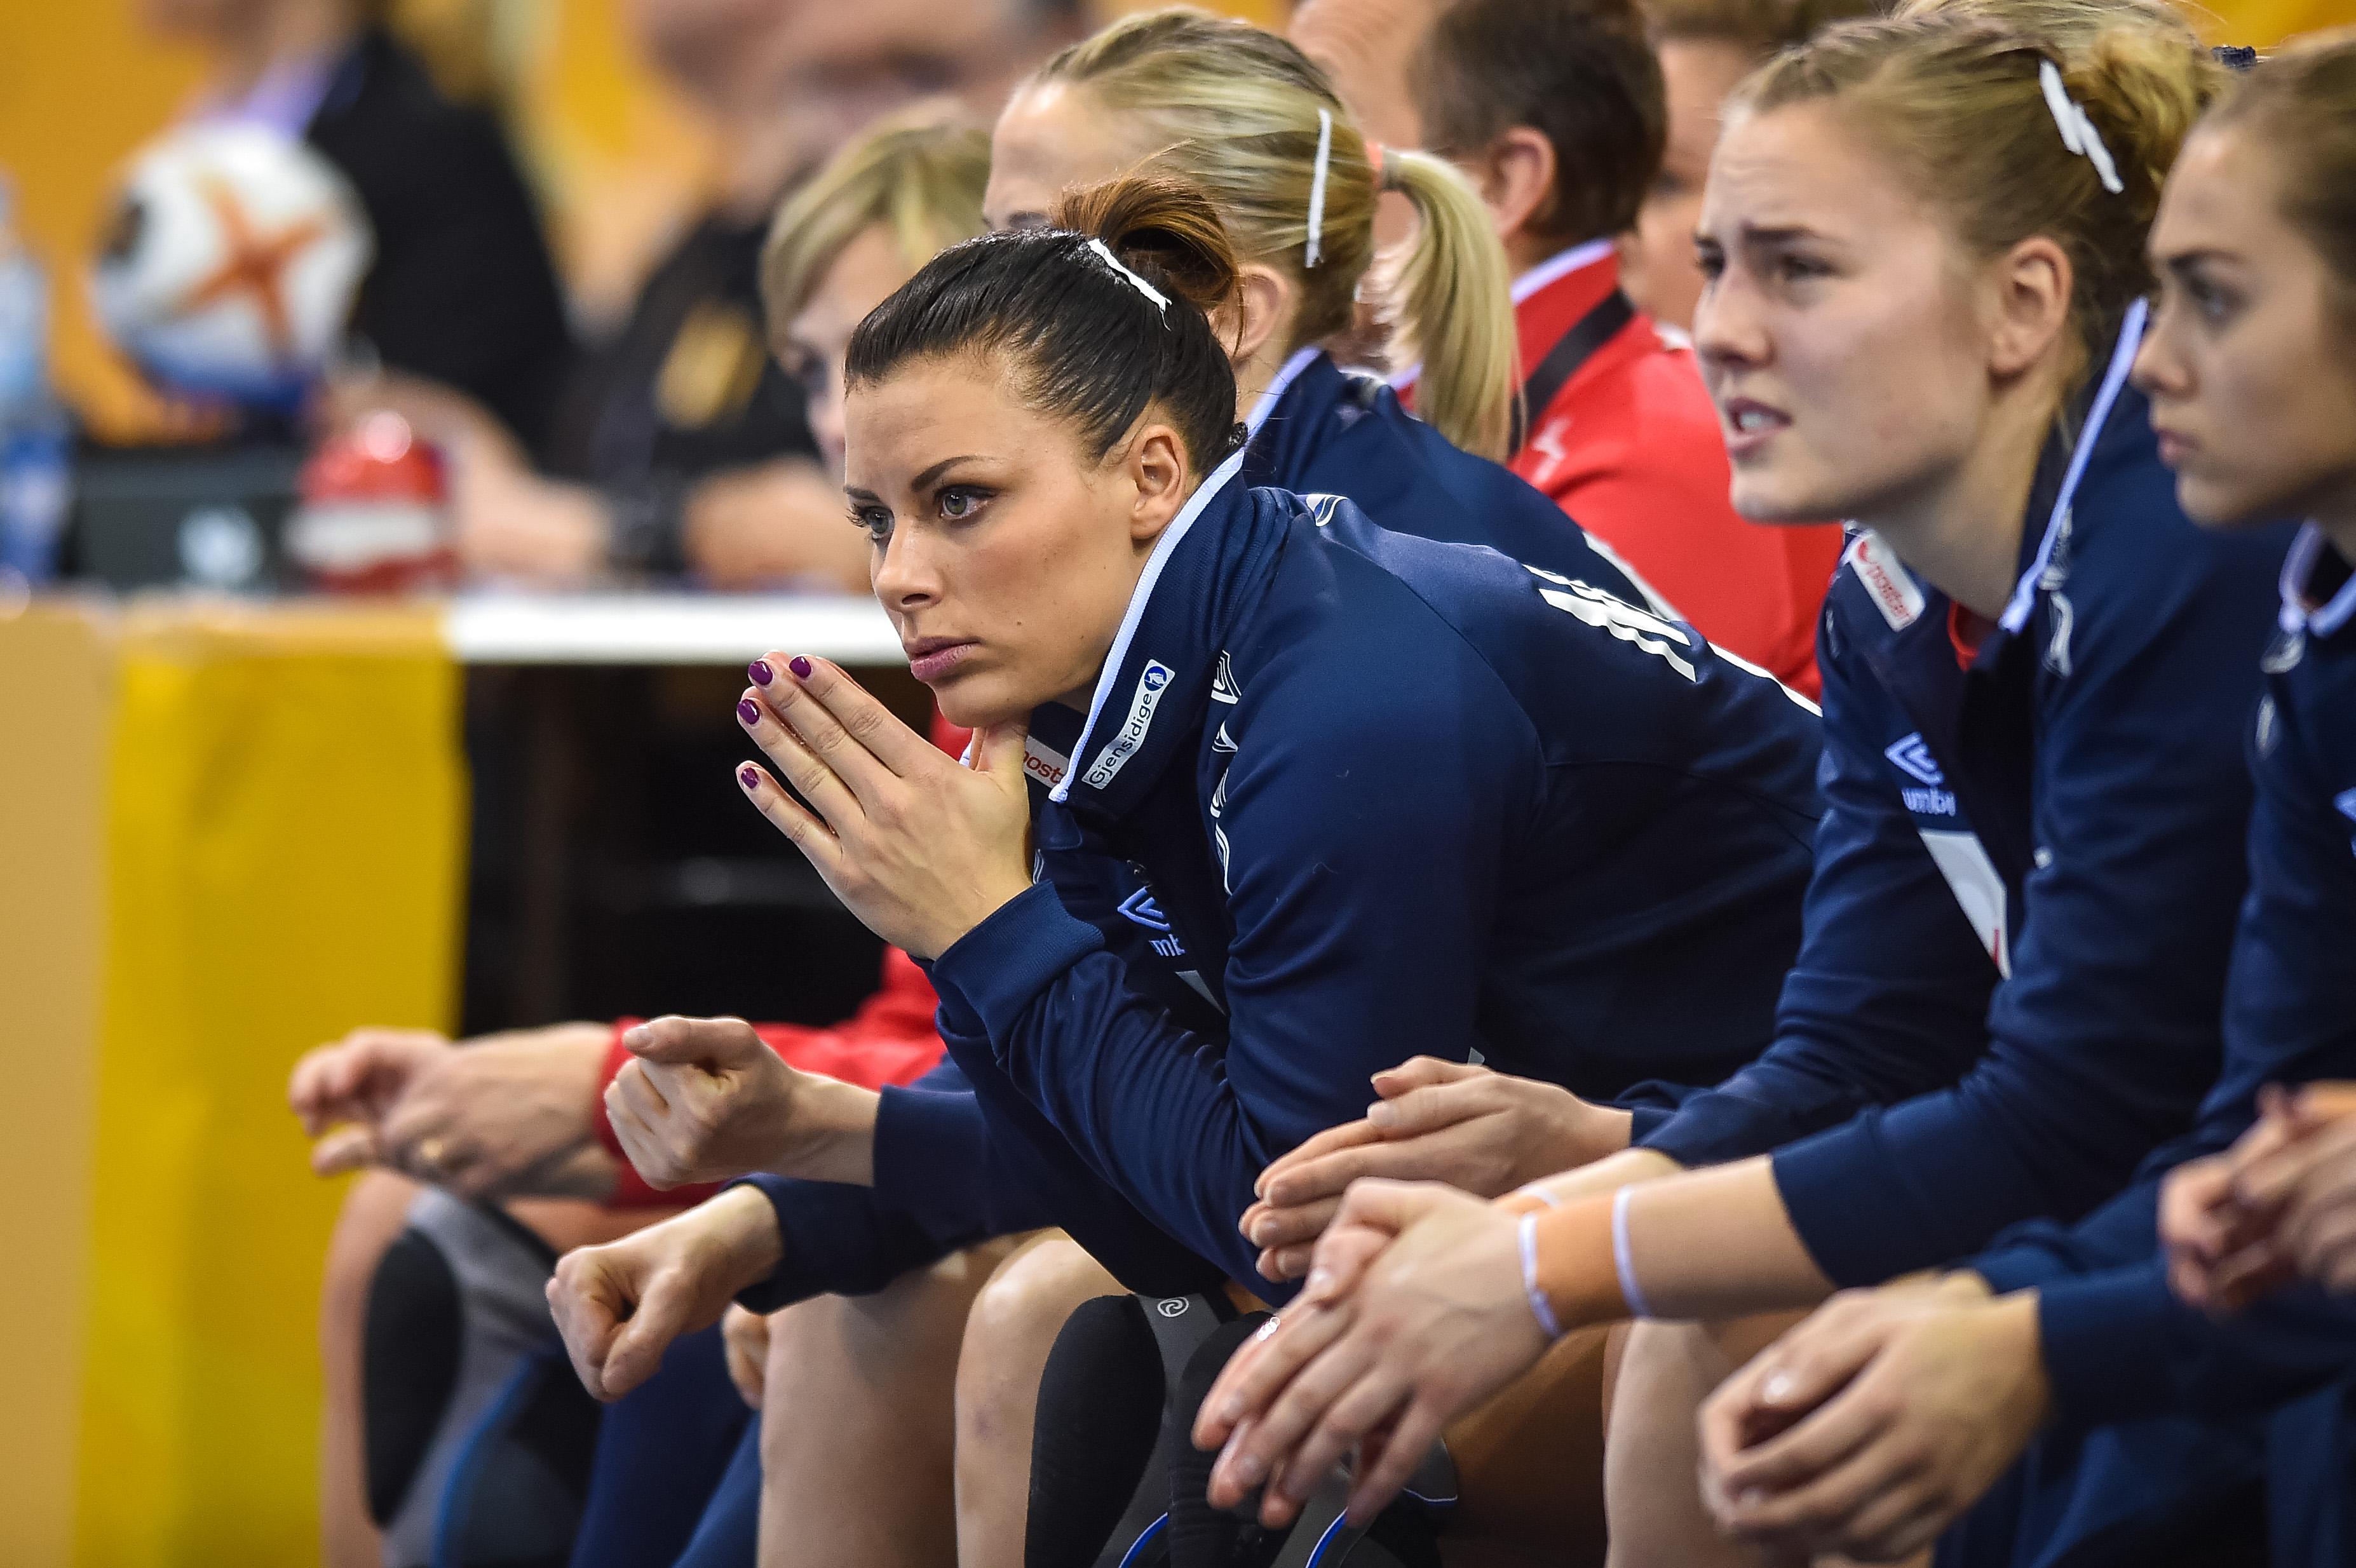 Olympic Handball Star Nora Mork Accuses Mens Team Of Circulating